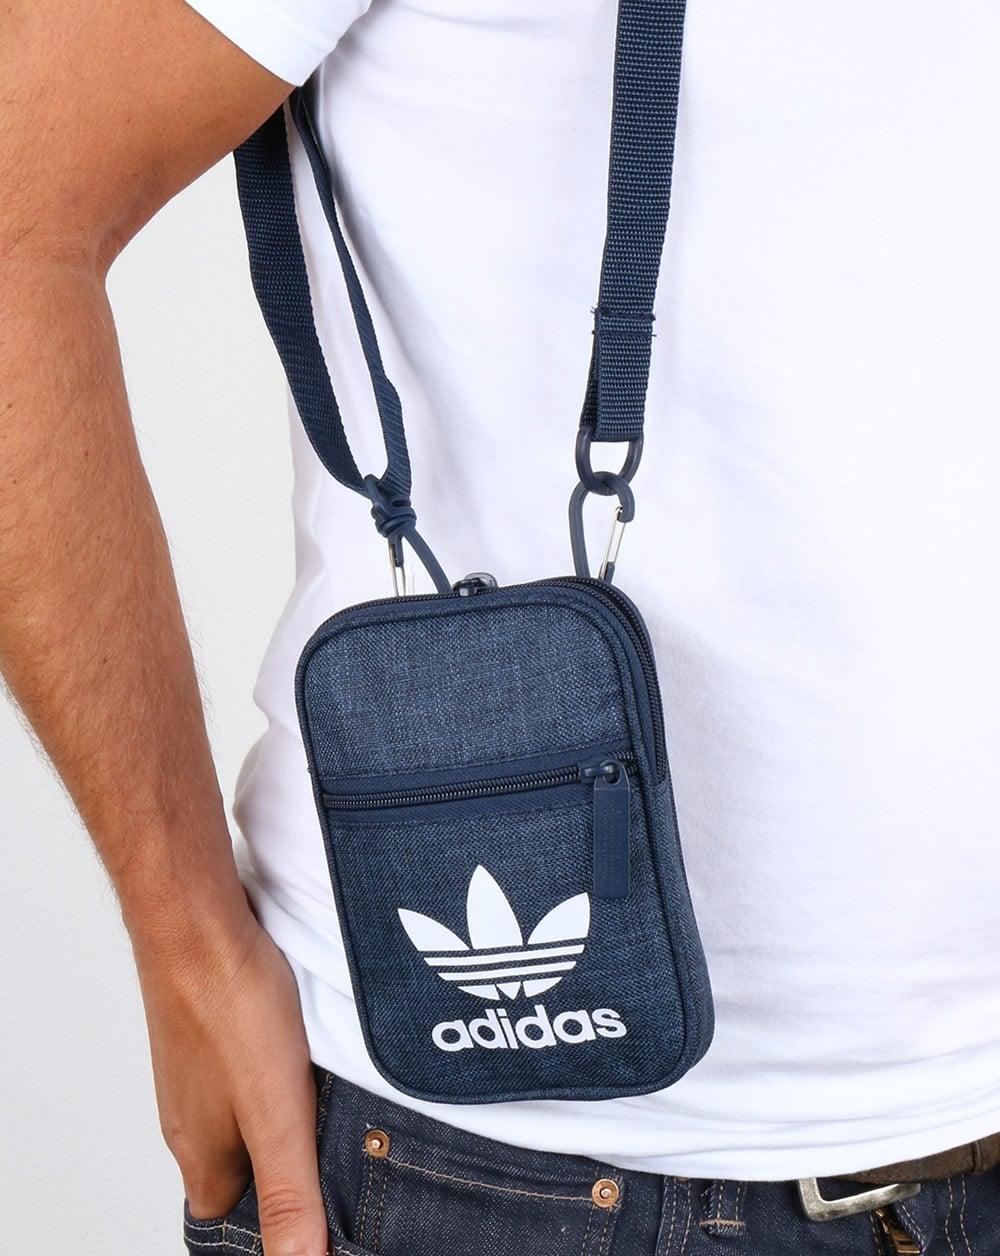 adidas fest bag casual - 64% remise